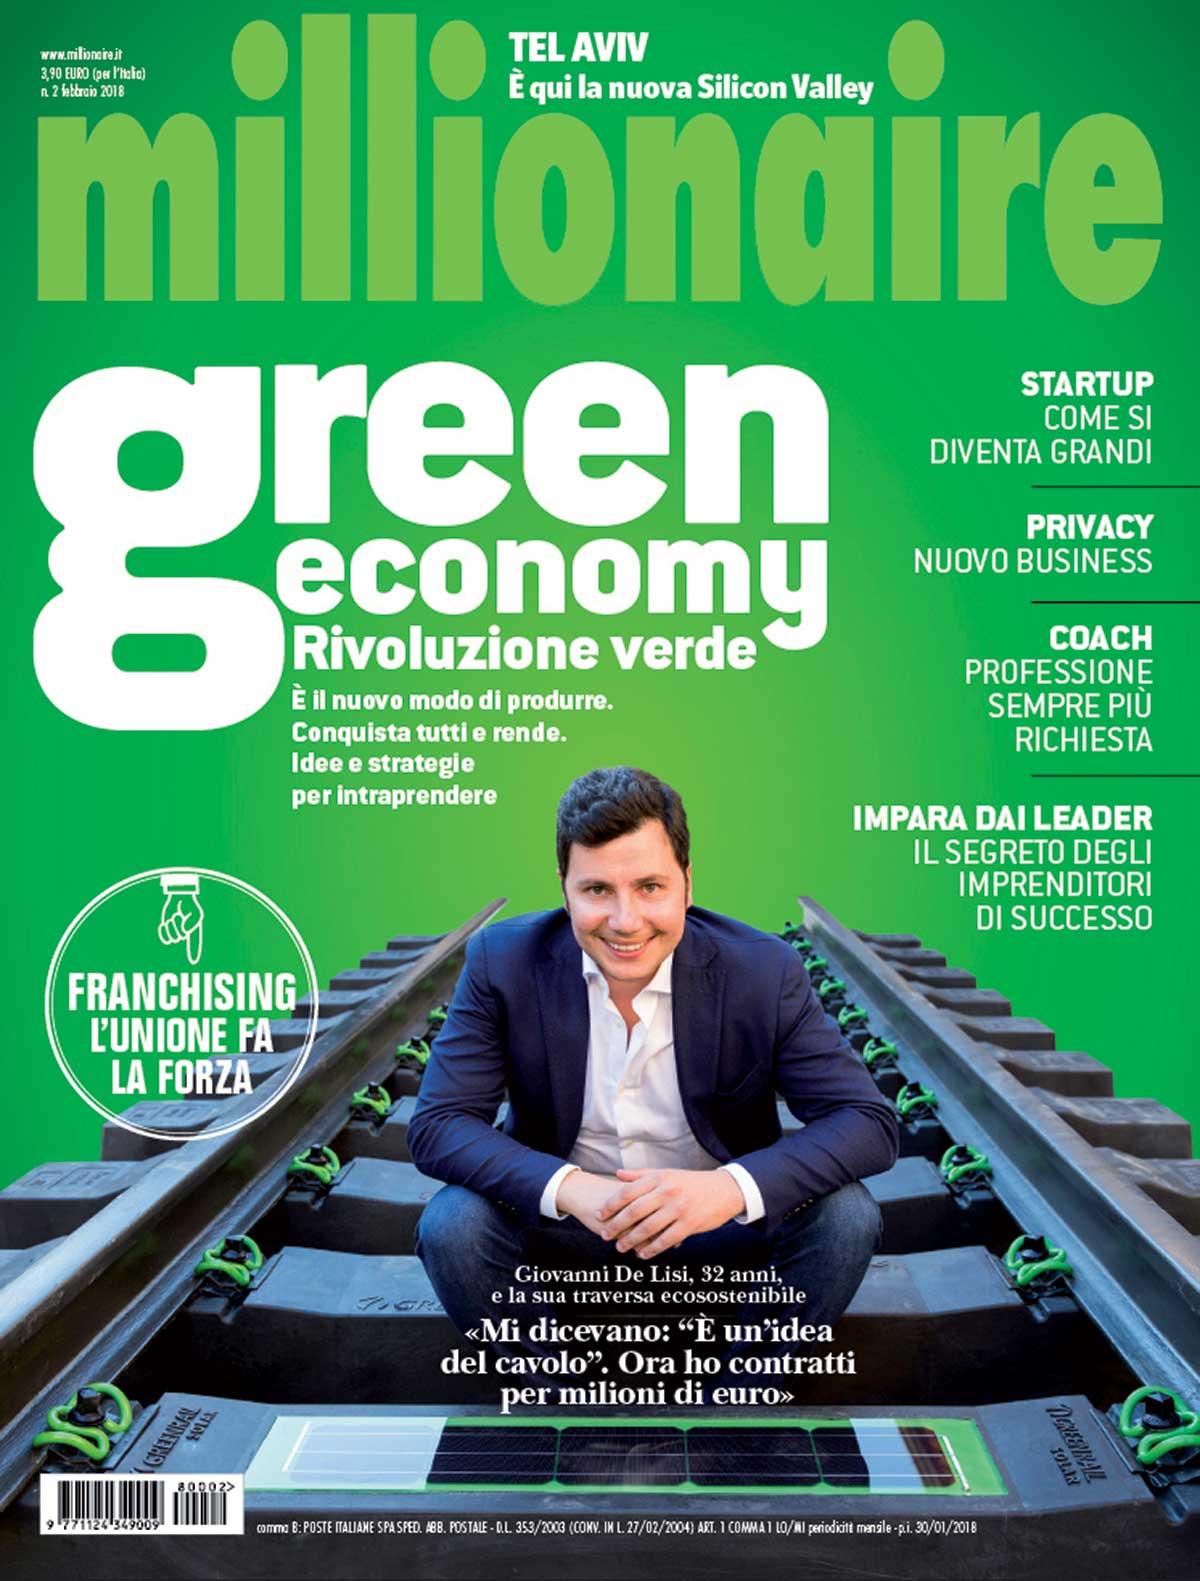 Millionaire intervista Antonio Chiarello